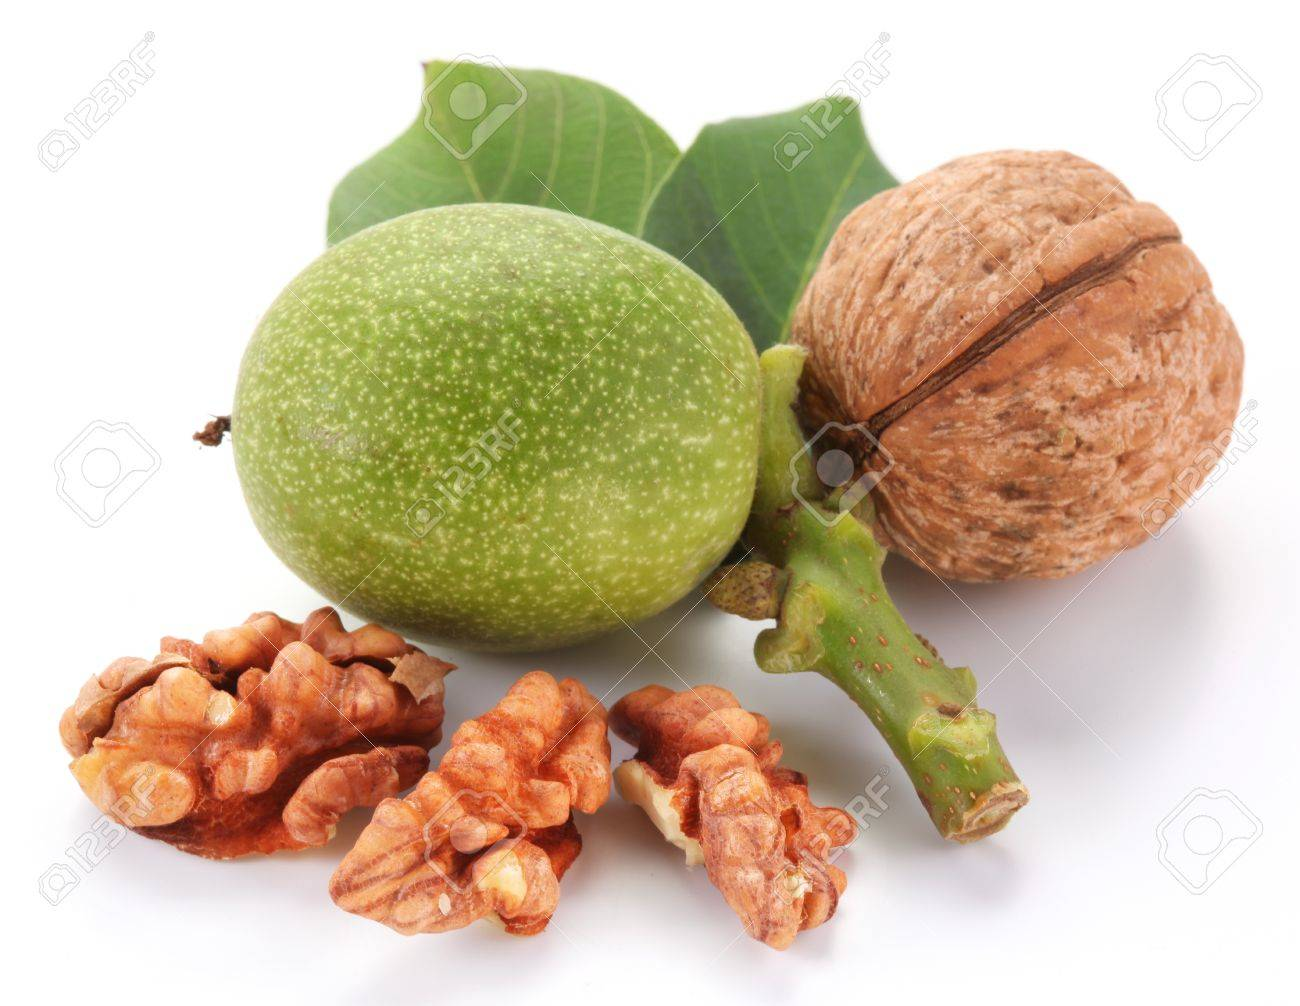 Green walnut; peeled walnut and its kernels. Isolated on a white background. Stock Photo - 10298938